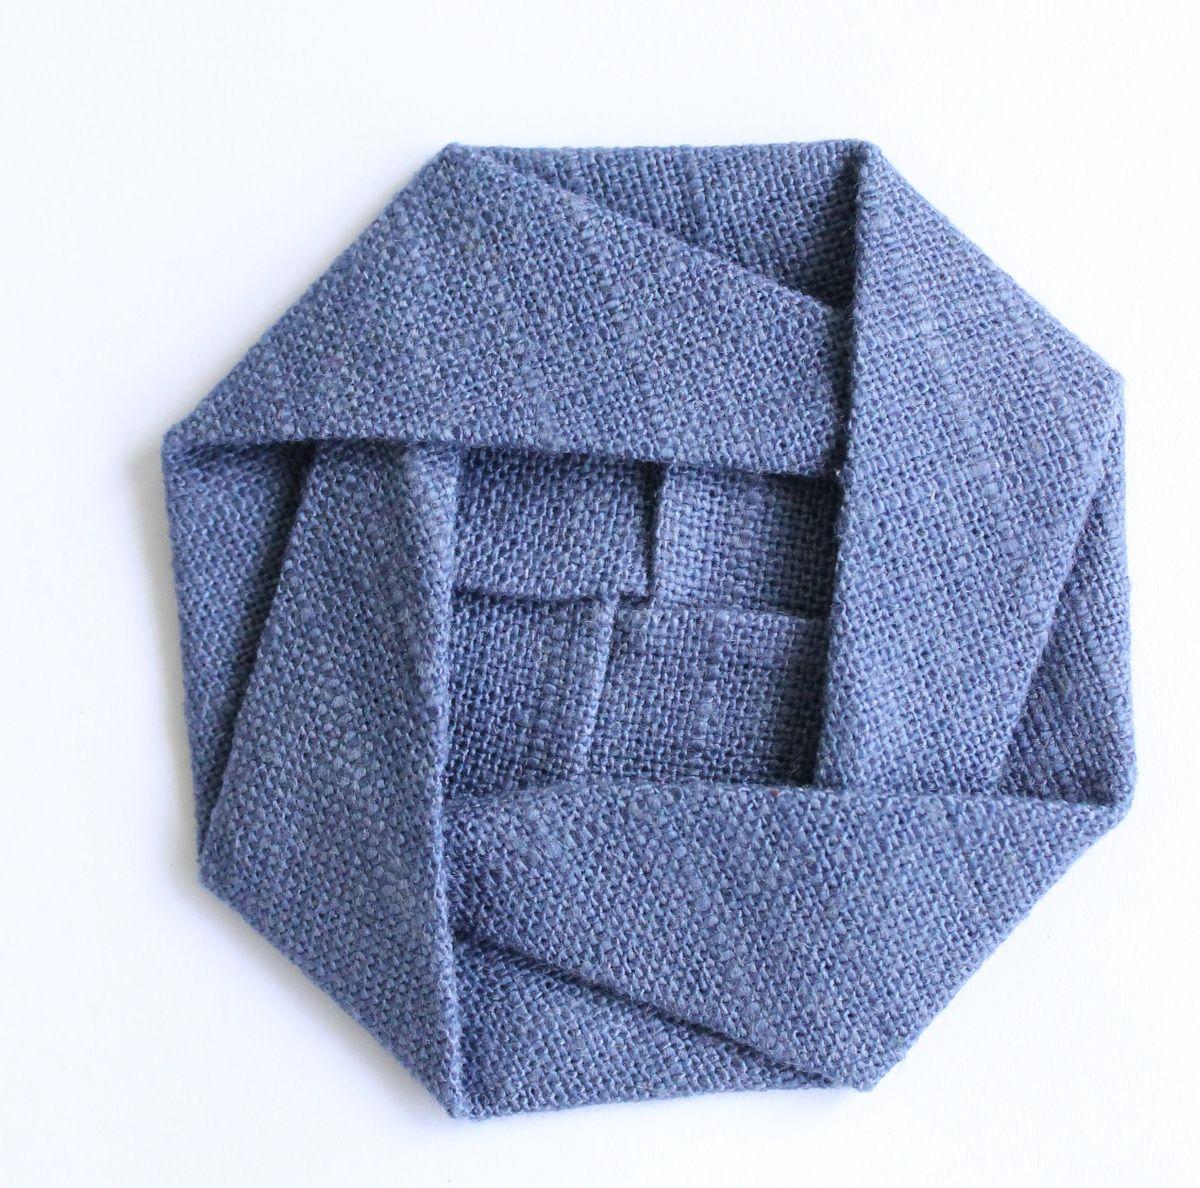 Origami Roses In 2018 Diy Pinterest Fabric Flowers Origami